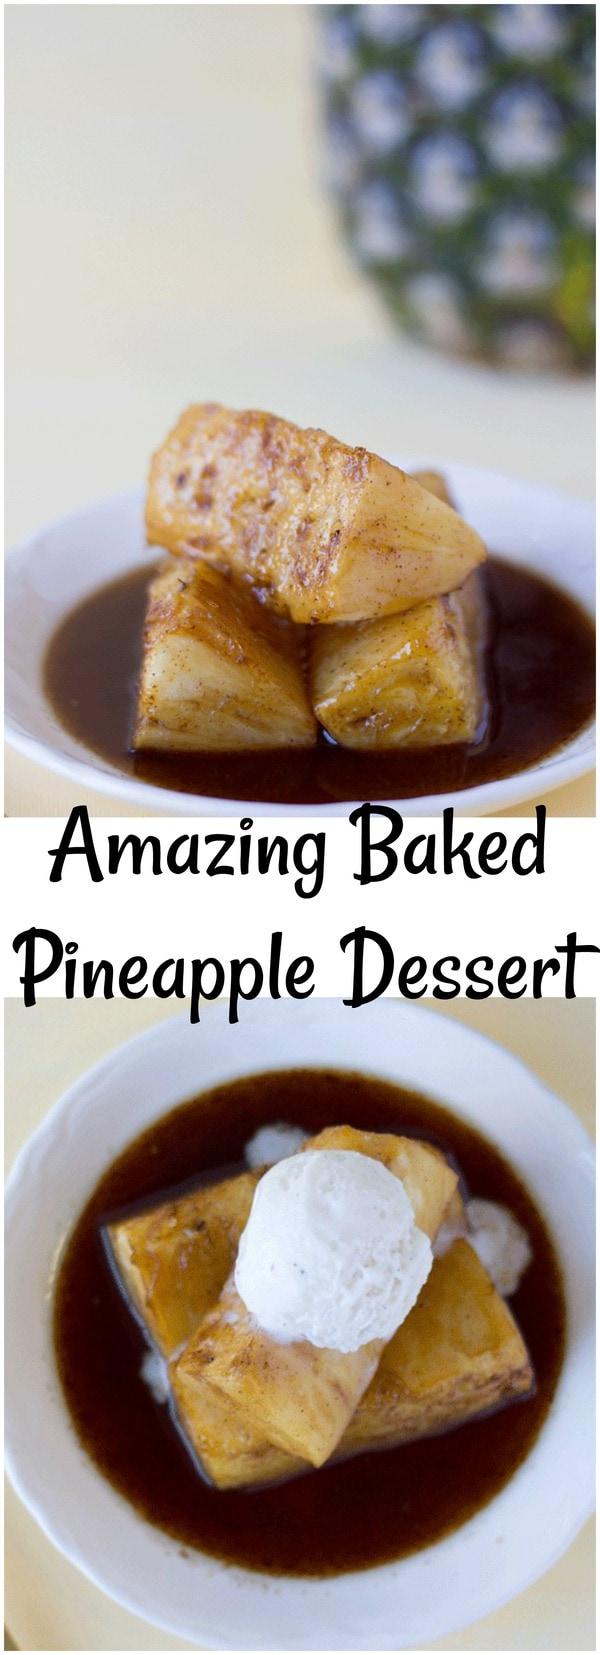 Breakfast Crockpot Recipes